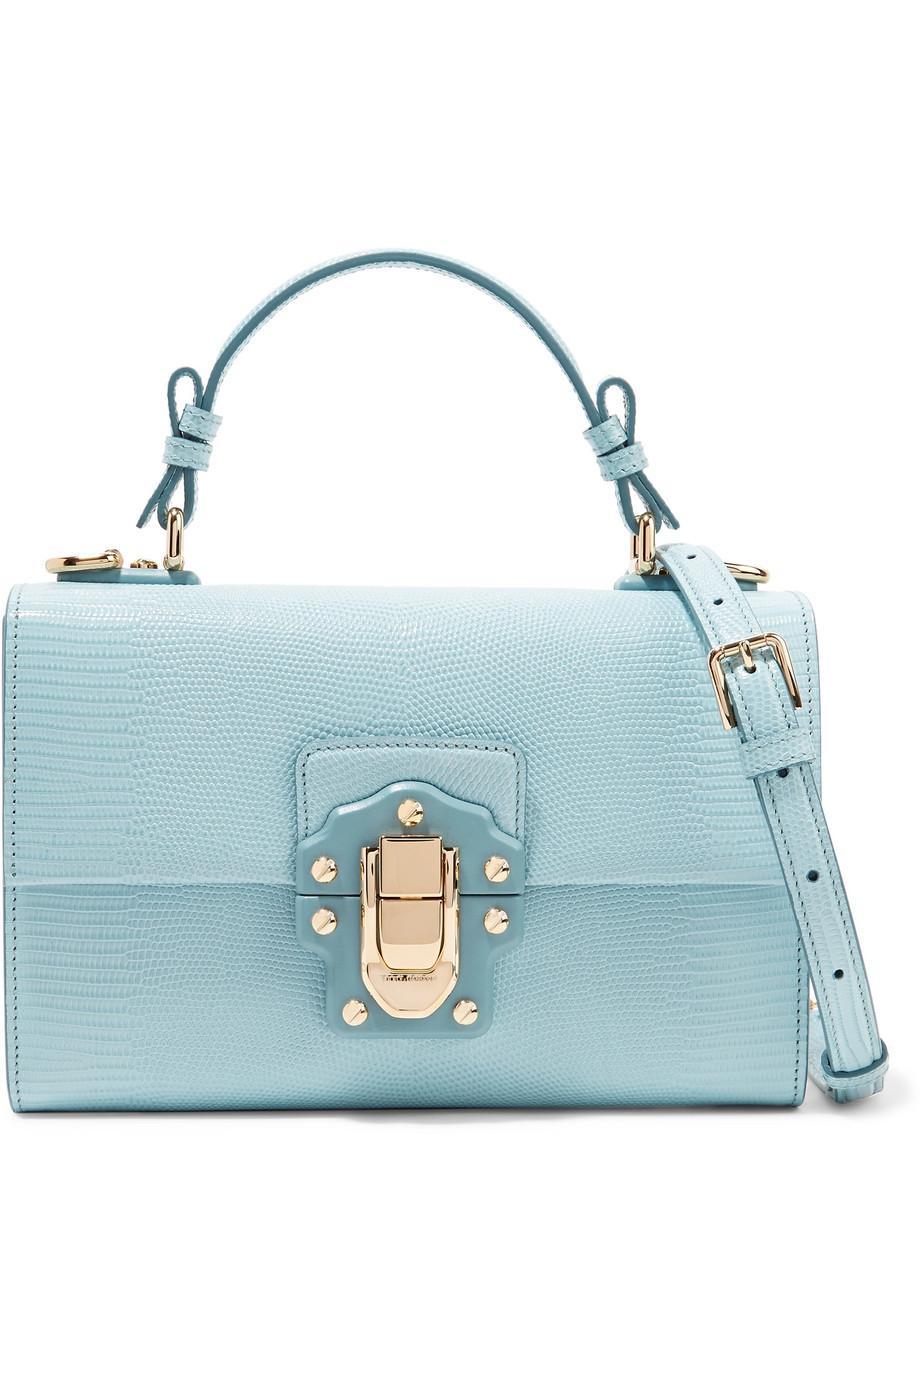 Lucia Lizard-effect Leather Shoulder Bag - Sky blue Dolce & Gabbana gBhl7w